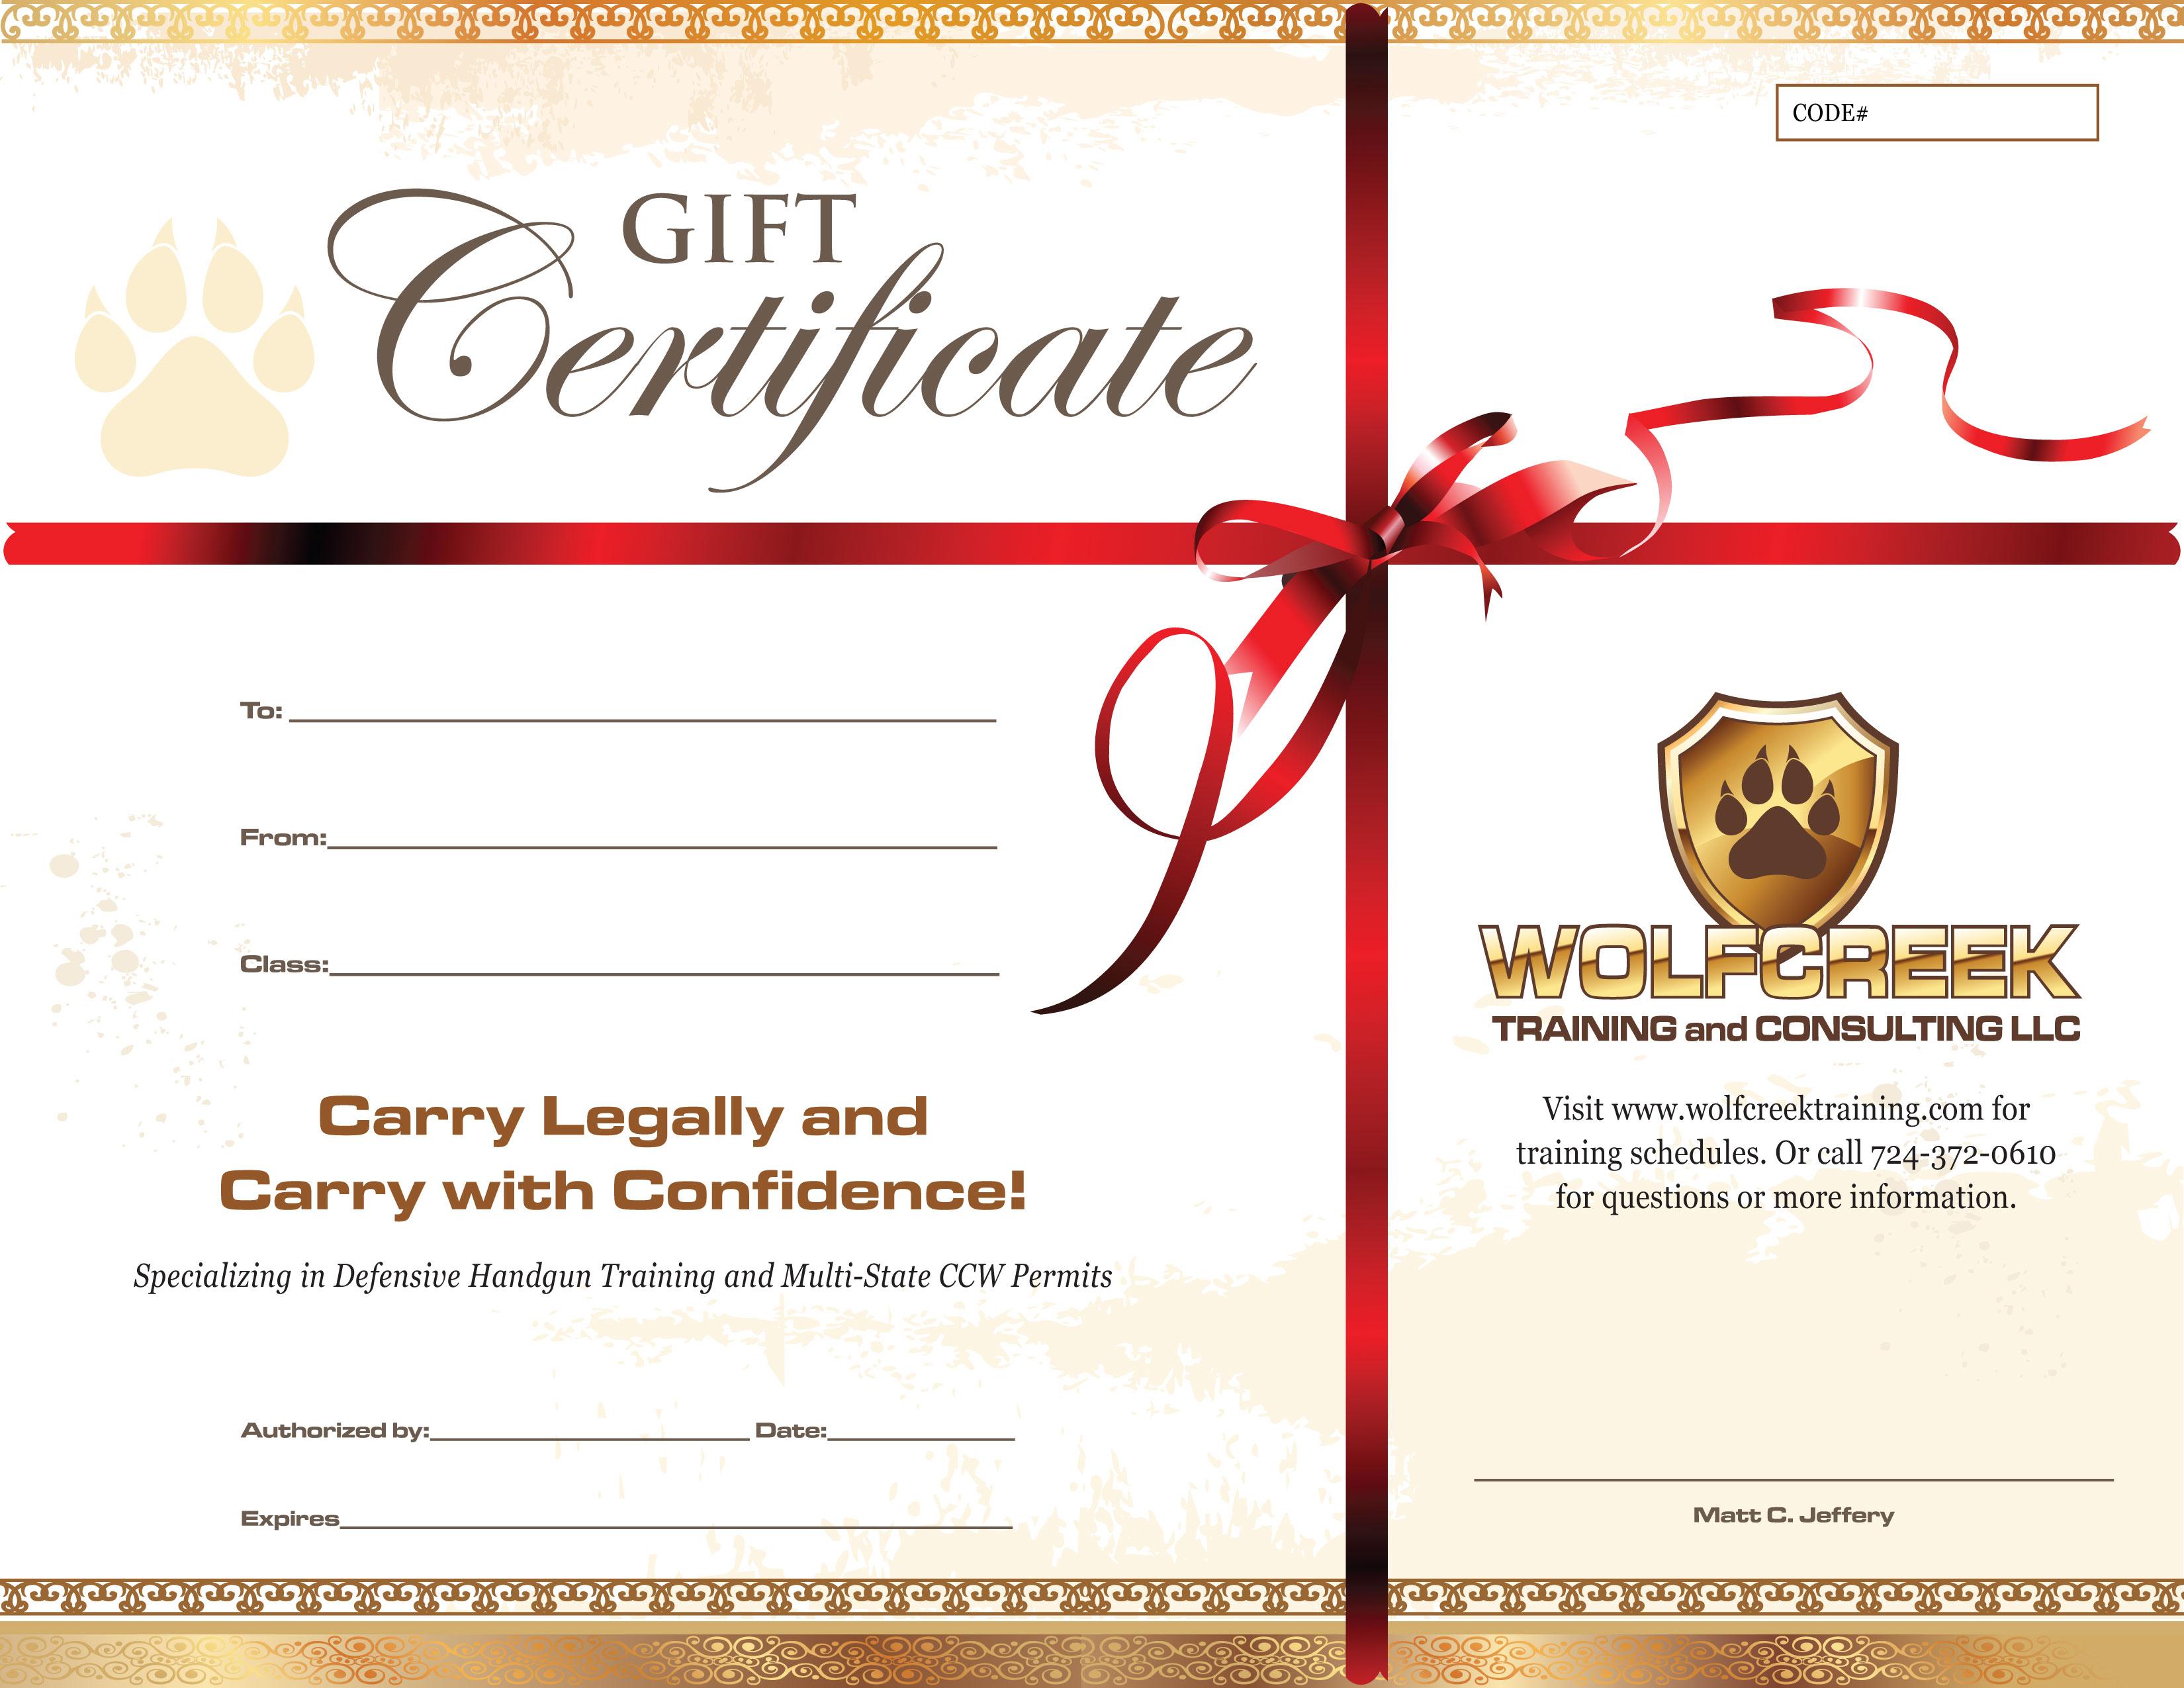 Wolfcreek Gift Certificates